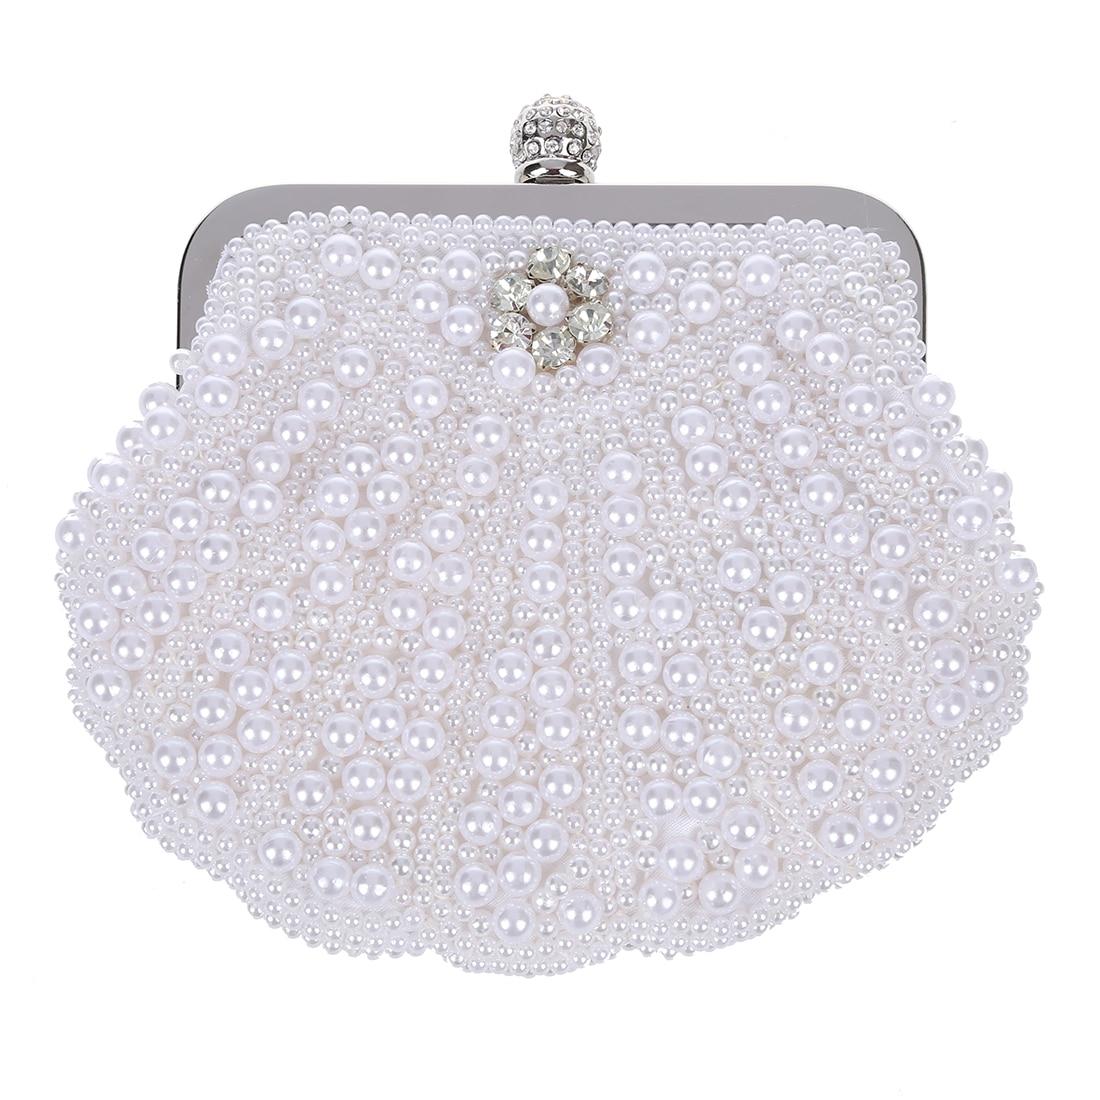 5pcs of Elegant Pearl Bridal Clutch Bag Party Handbag Shell Bag White